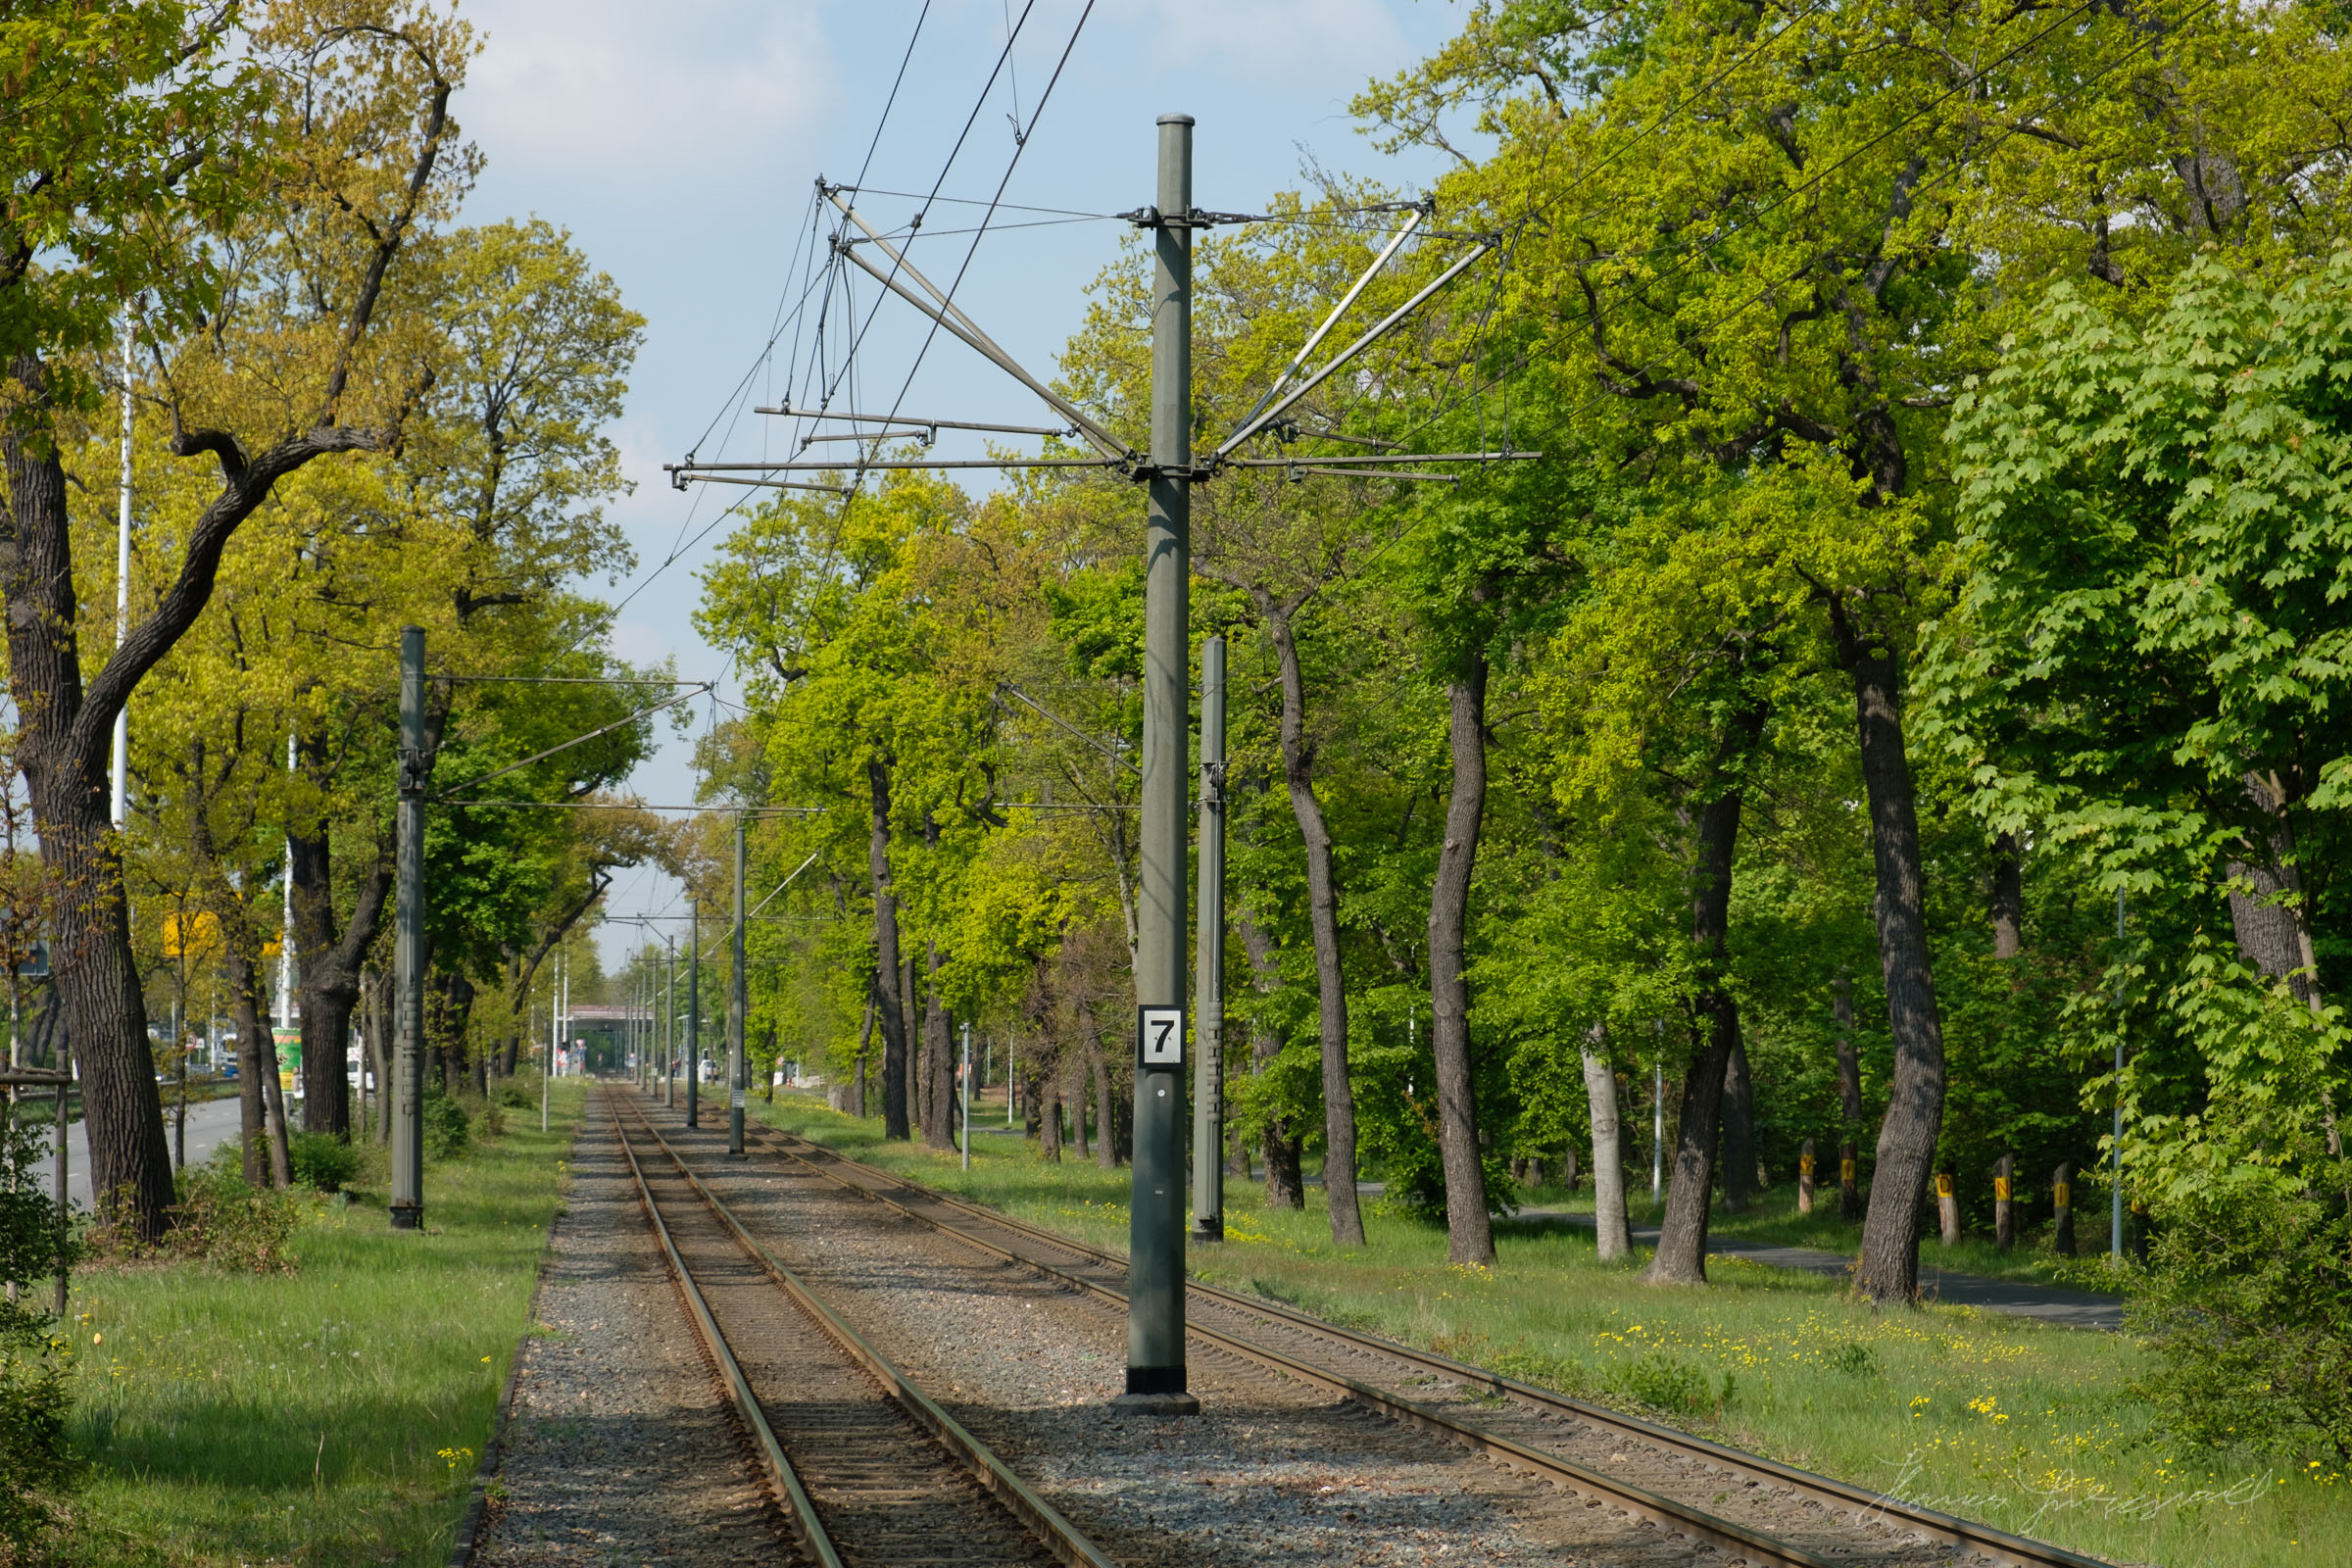 Leafy Suburbs of Darmstadt